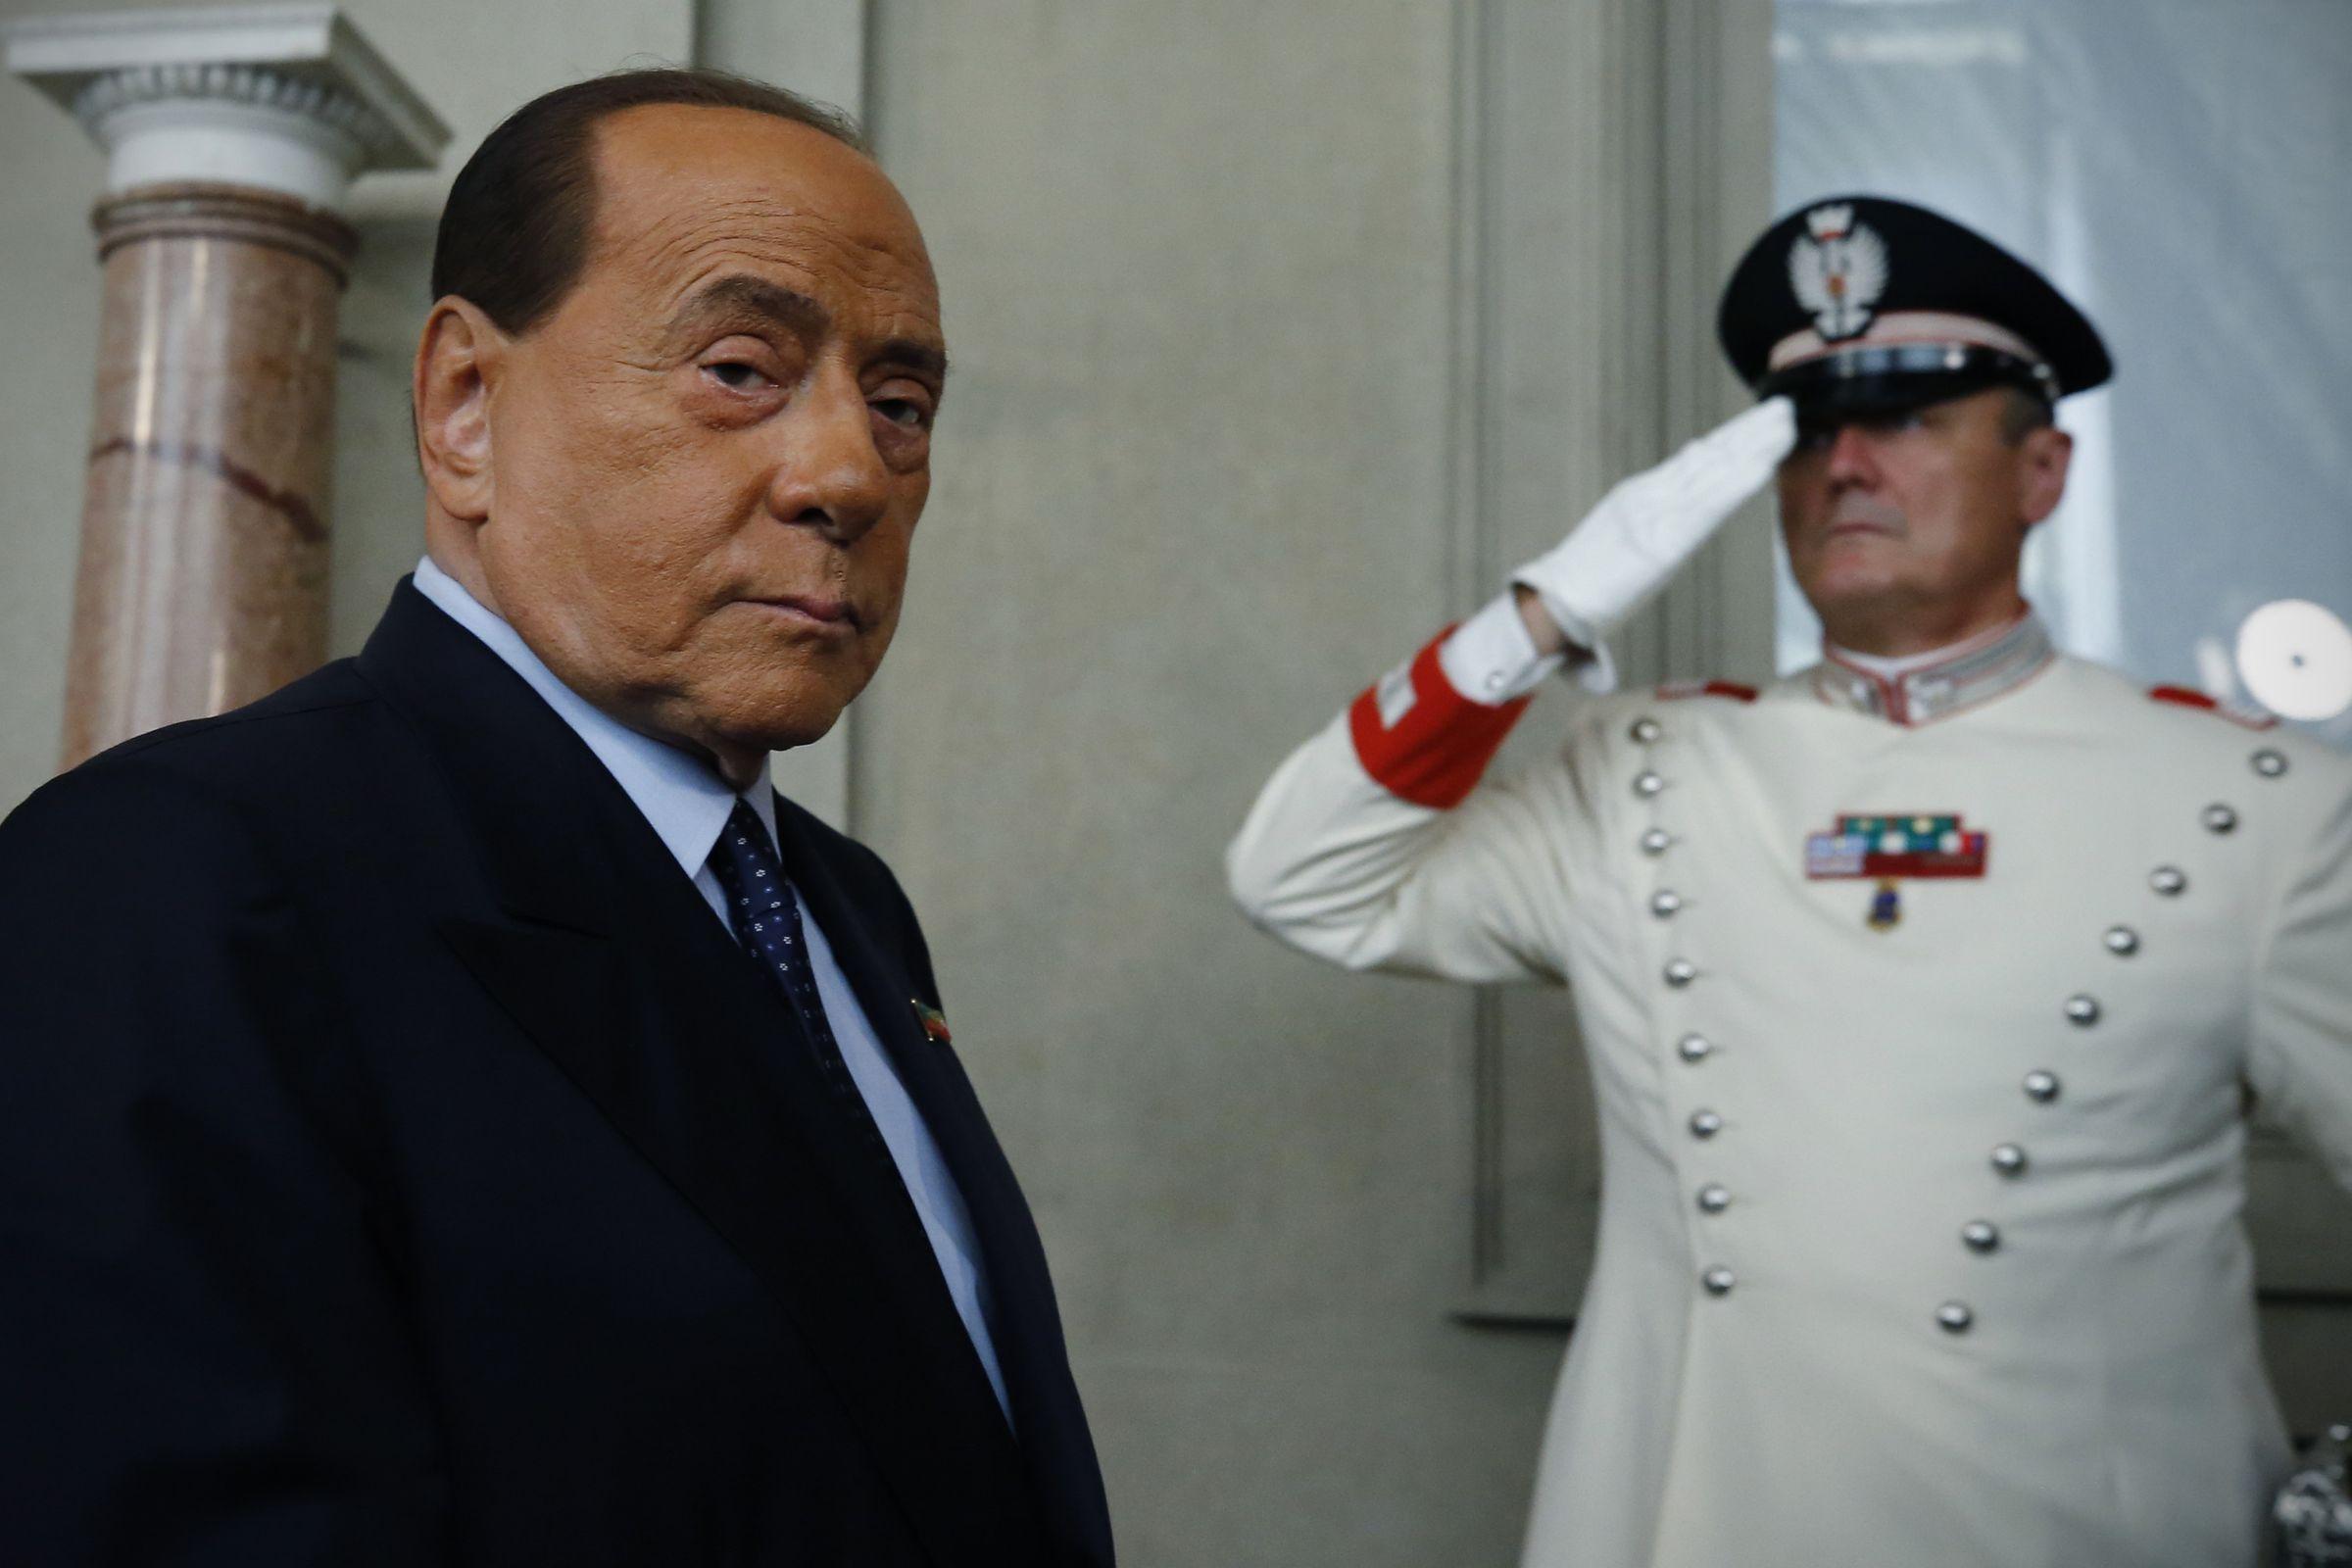 <p>Бывший премьер-министр Италии Сильвио Берлускони. Фото © ТАСС / LaPresse via ZUMA Press / Vincenzo Livieri</p>